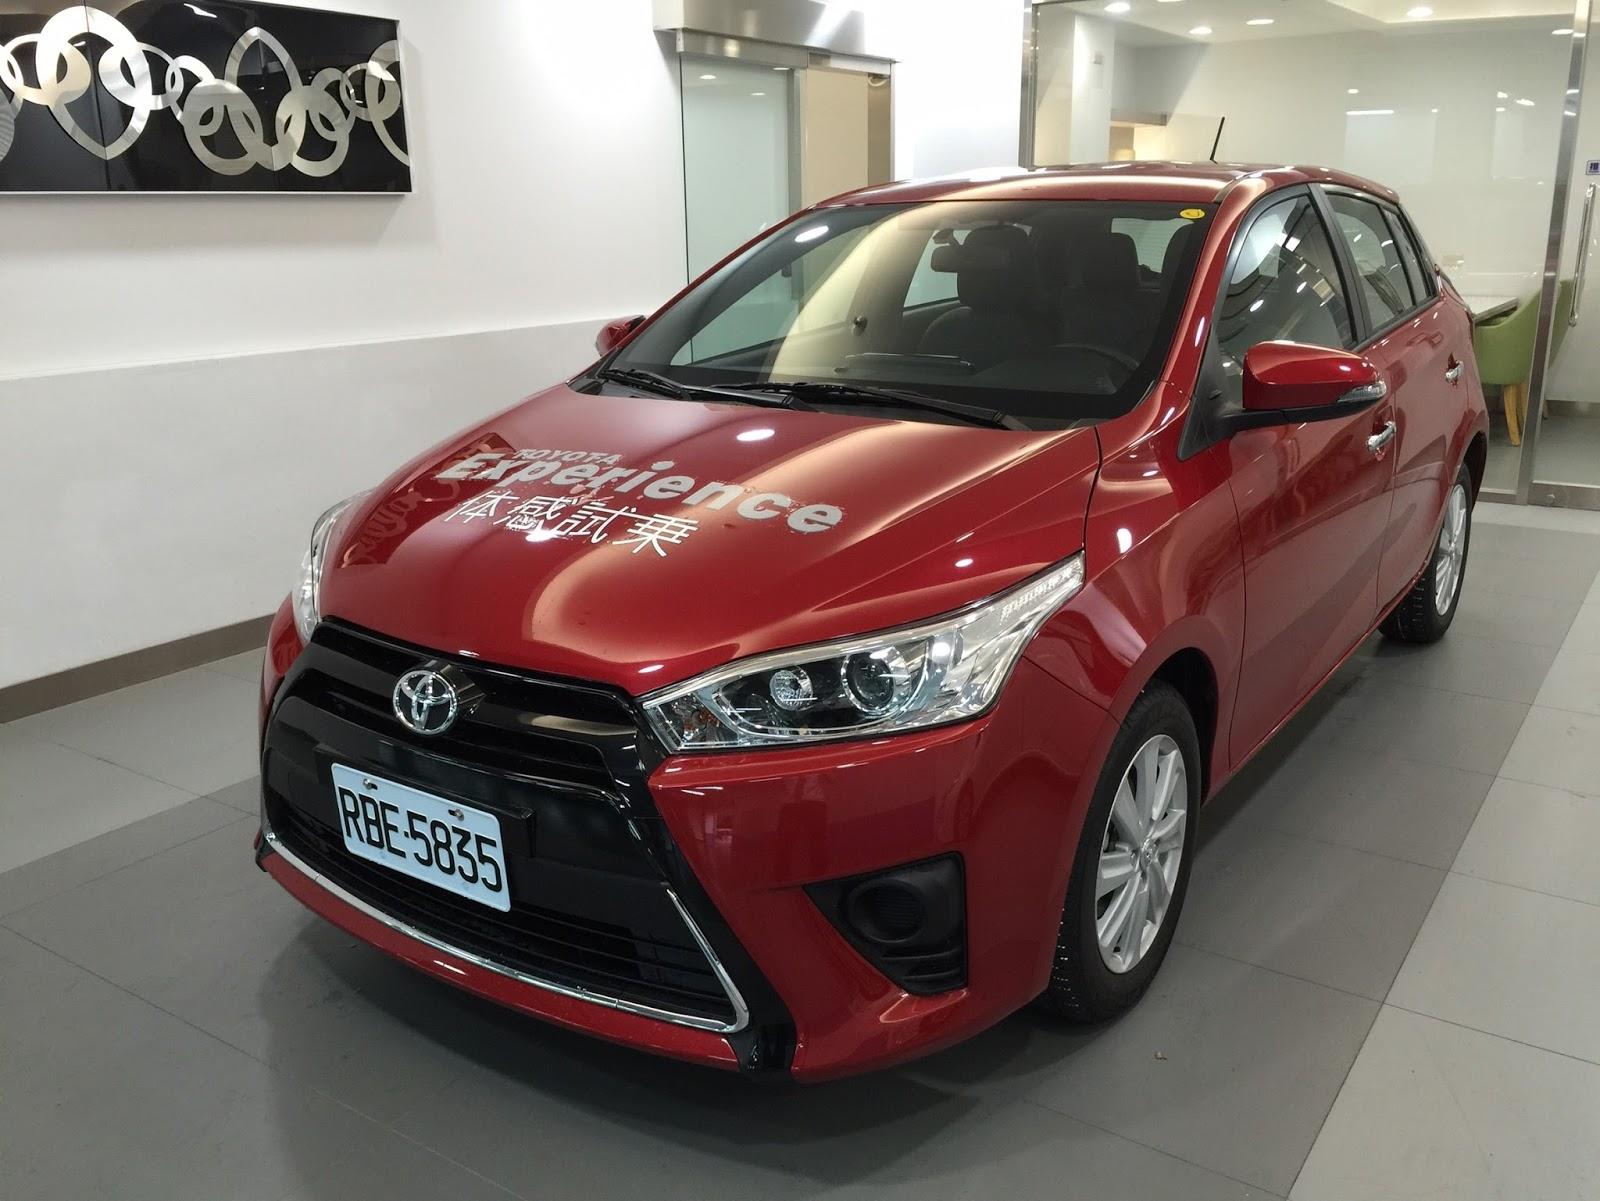 TOYOTA楊翰傑 - 您購車‧保險信賴的好朋友: 2016年5月改款YARIS紅色試乘車RBE-5835開箱! Part.1